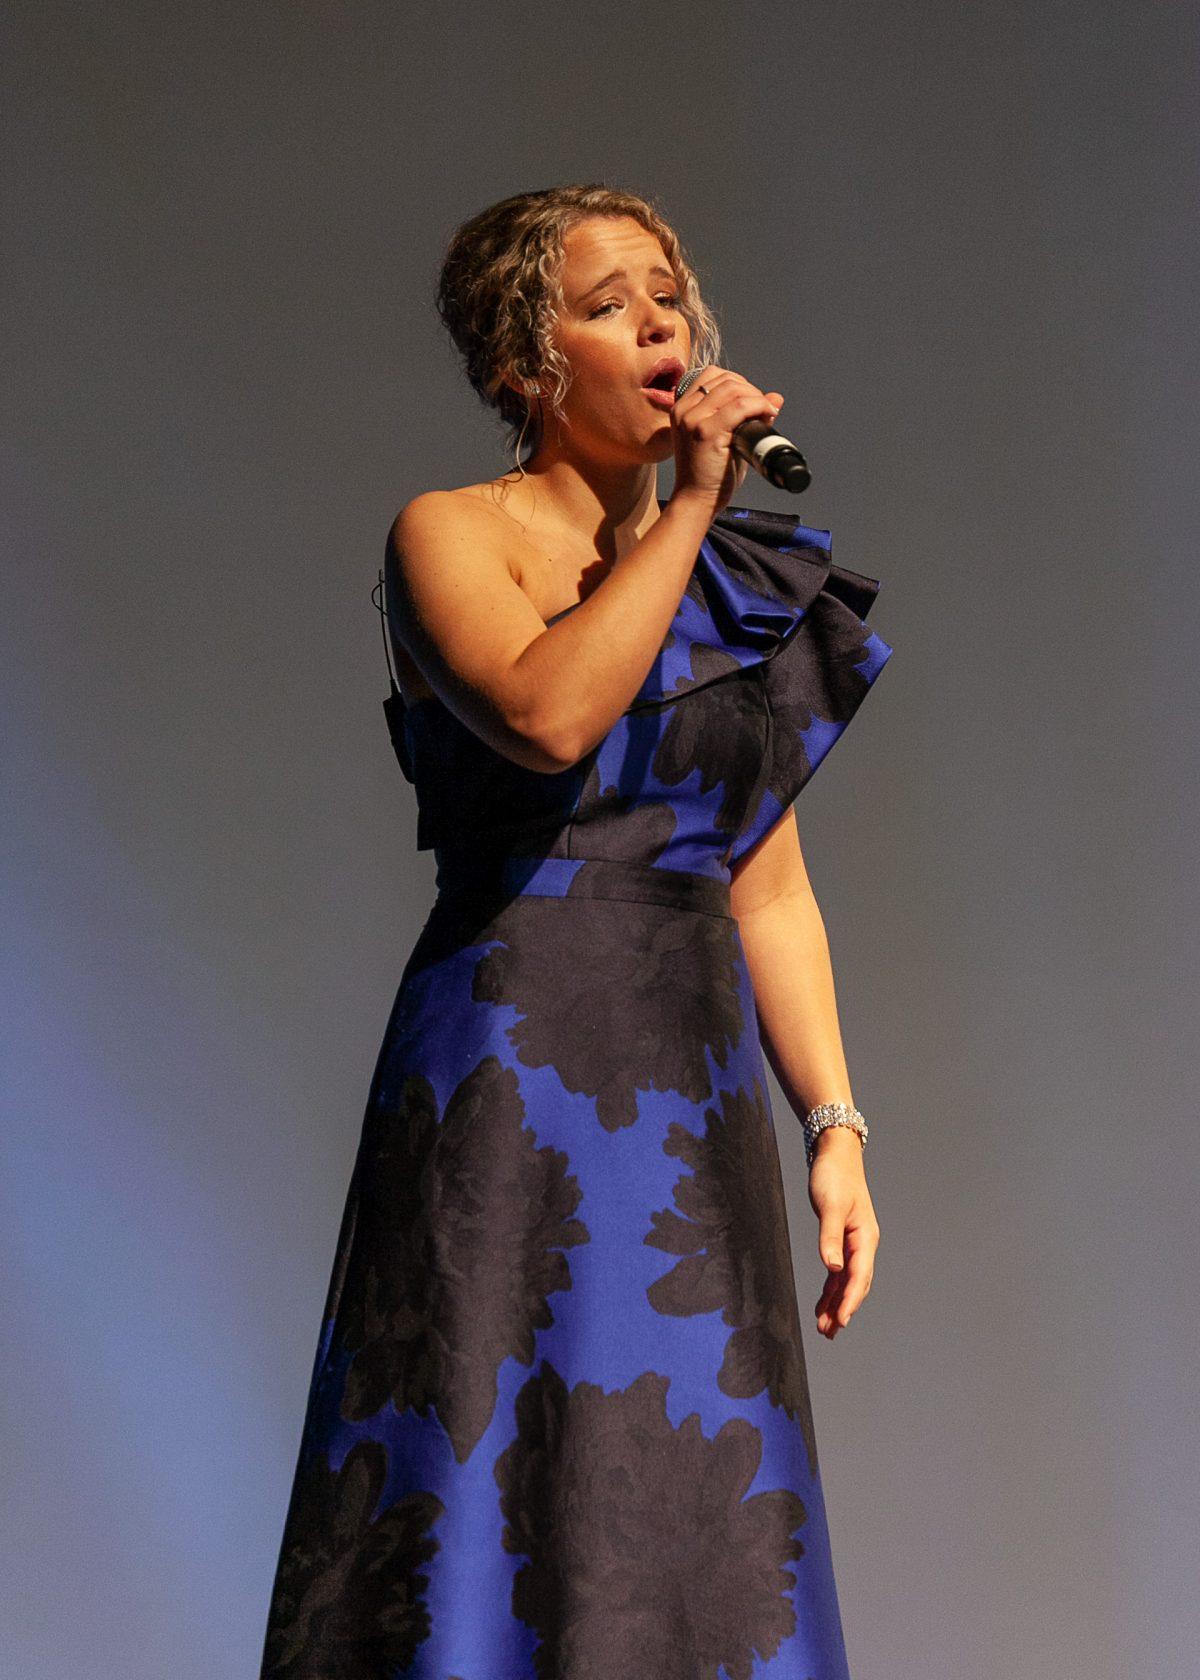 """Faulkner student Ashby Kasarjian sang Hero, by Mariah Carey during Faulkner's Annual Benefit Dinner on Oct. 3."""